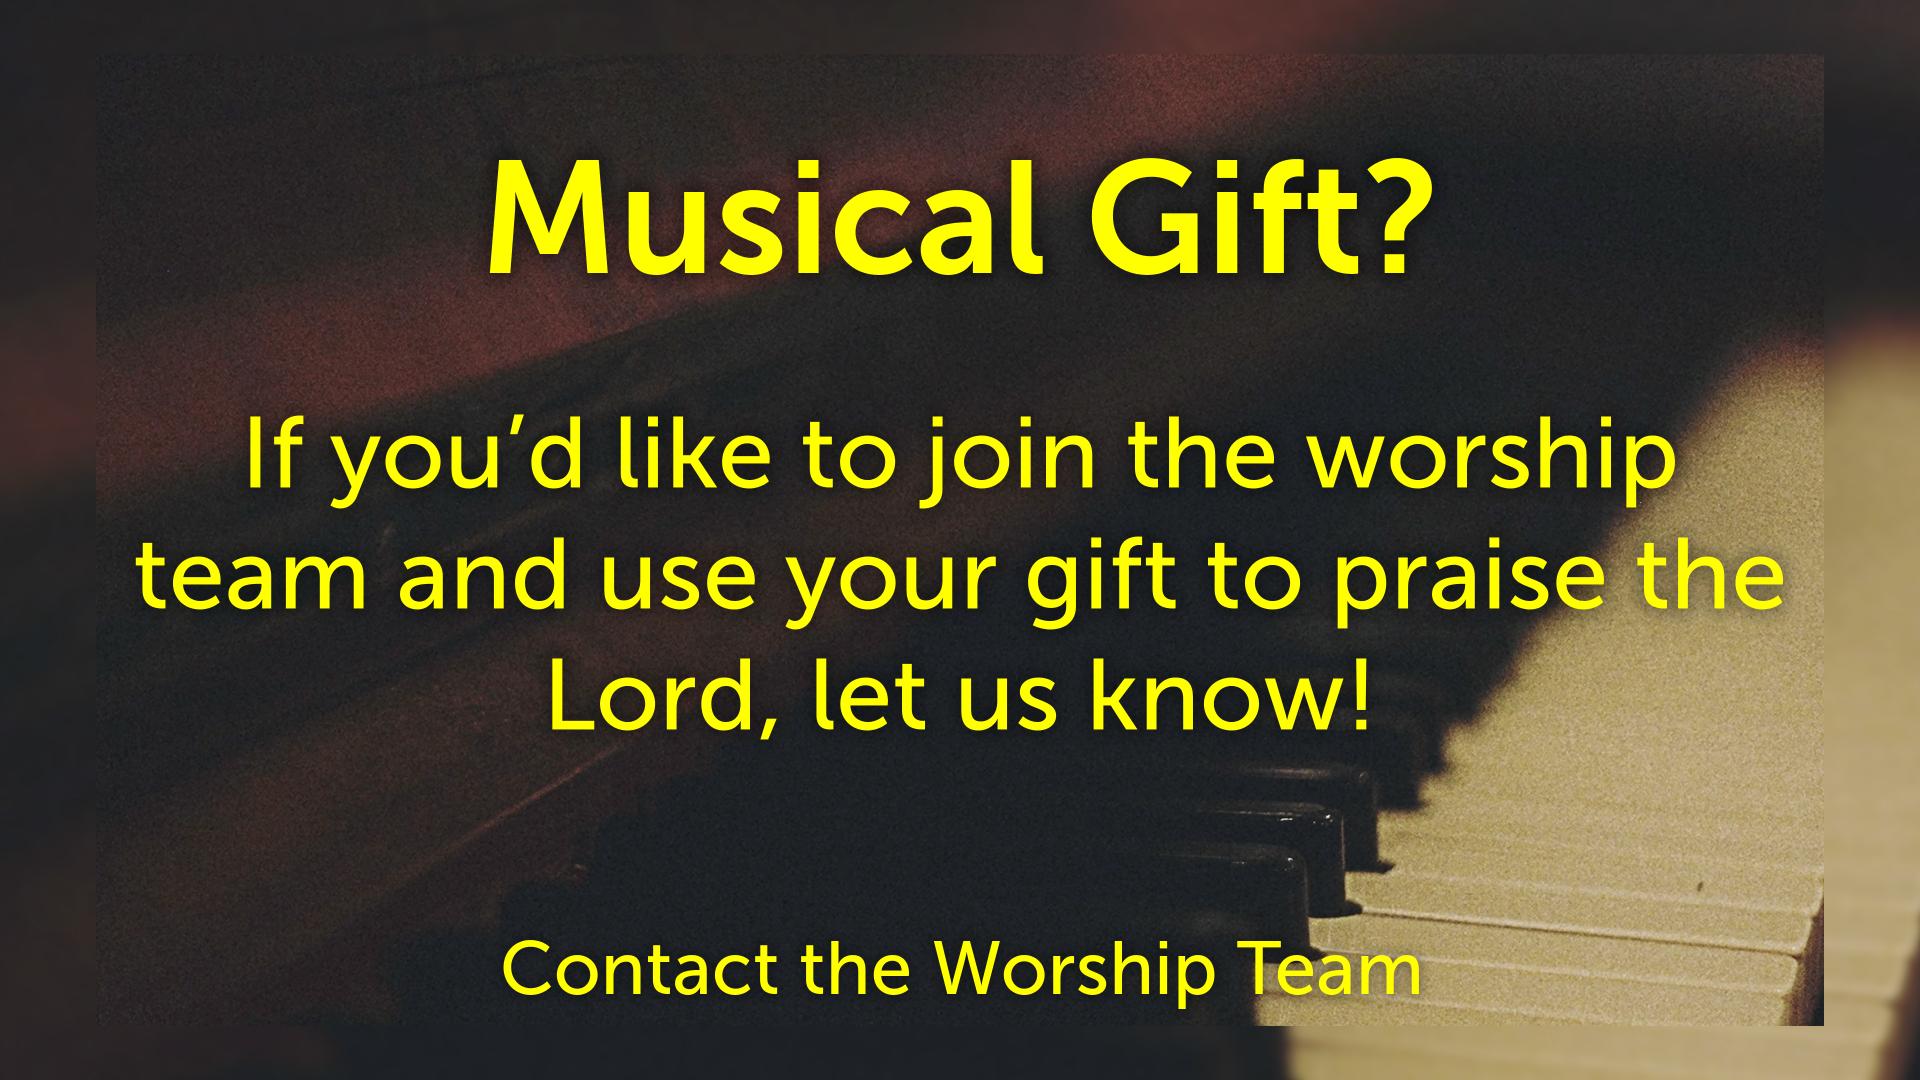 Musical Gift?